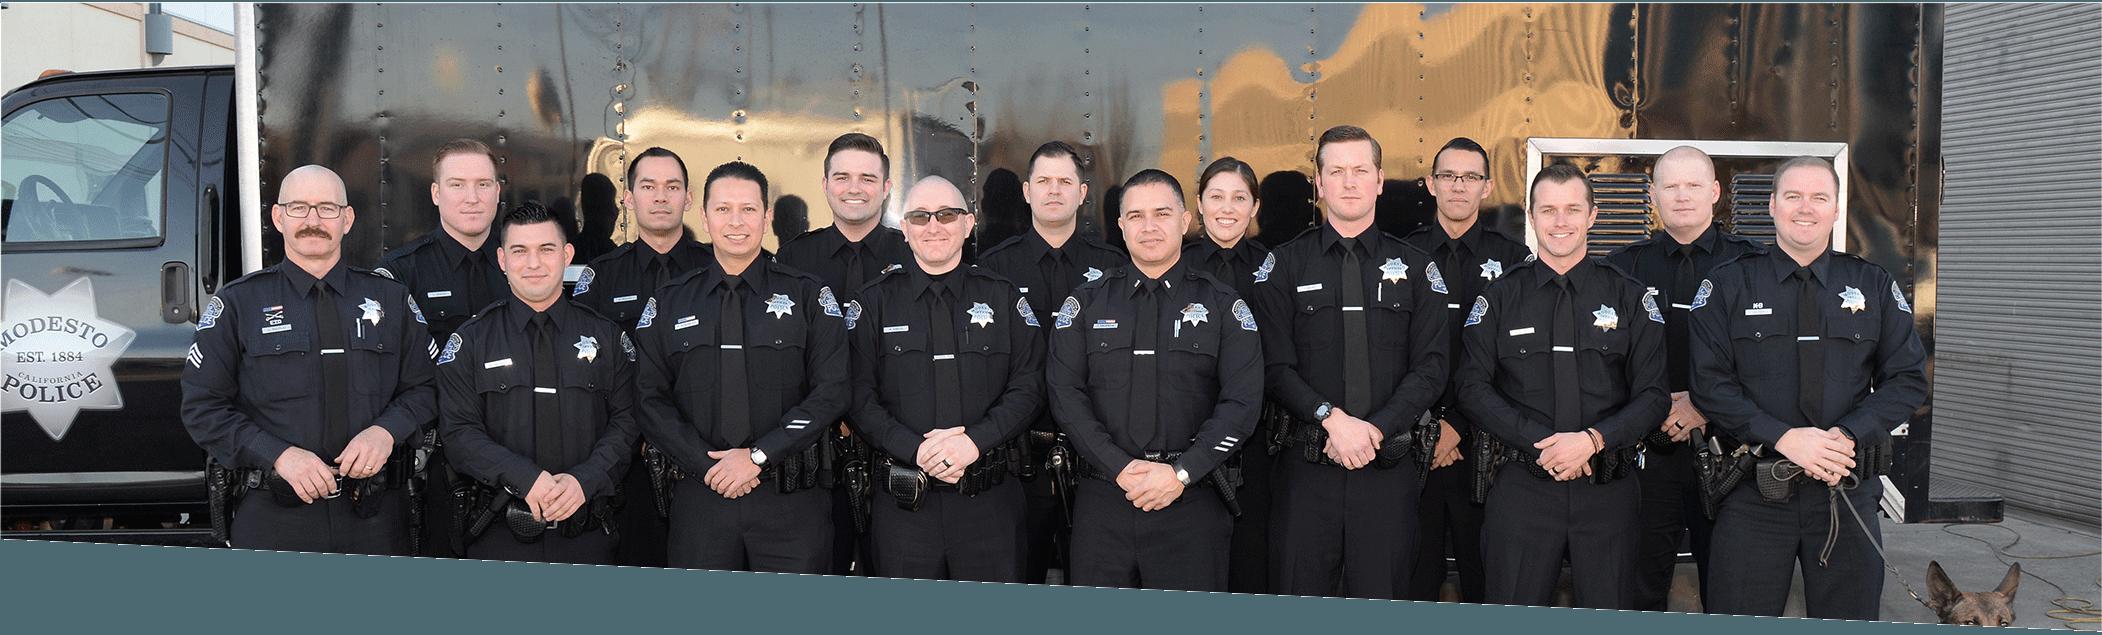 Police Department | Modesto, CA